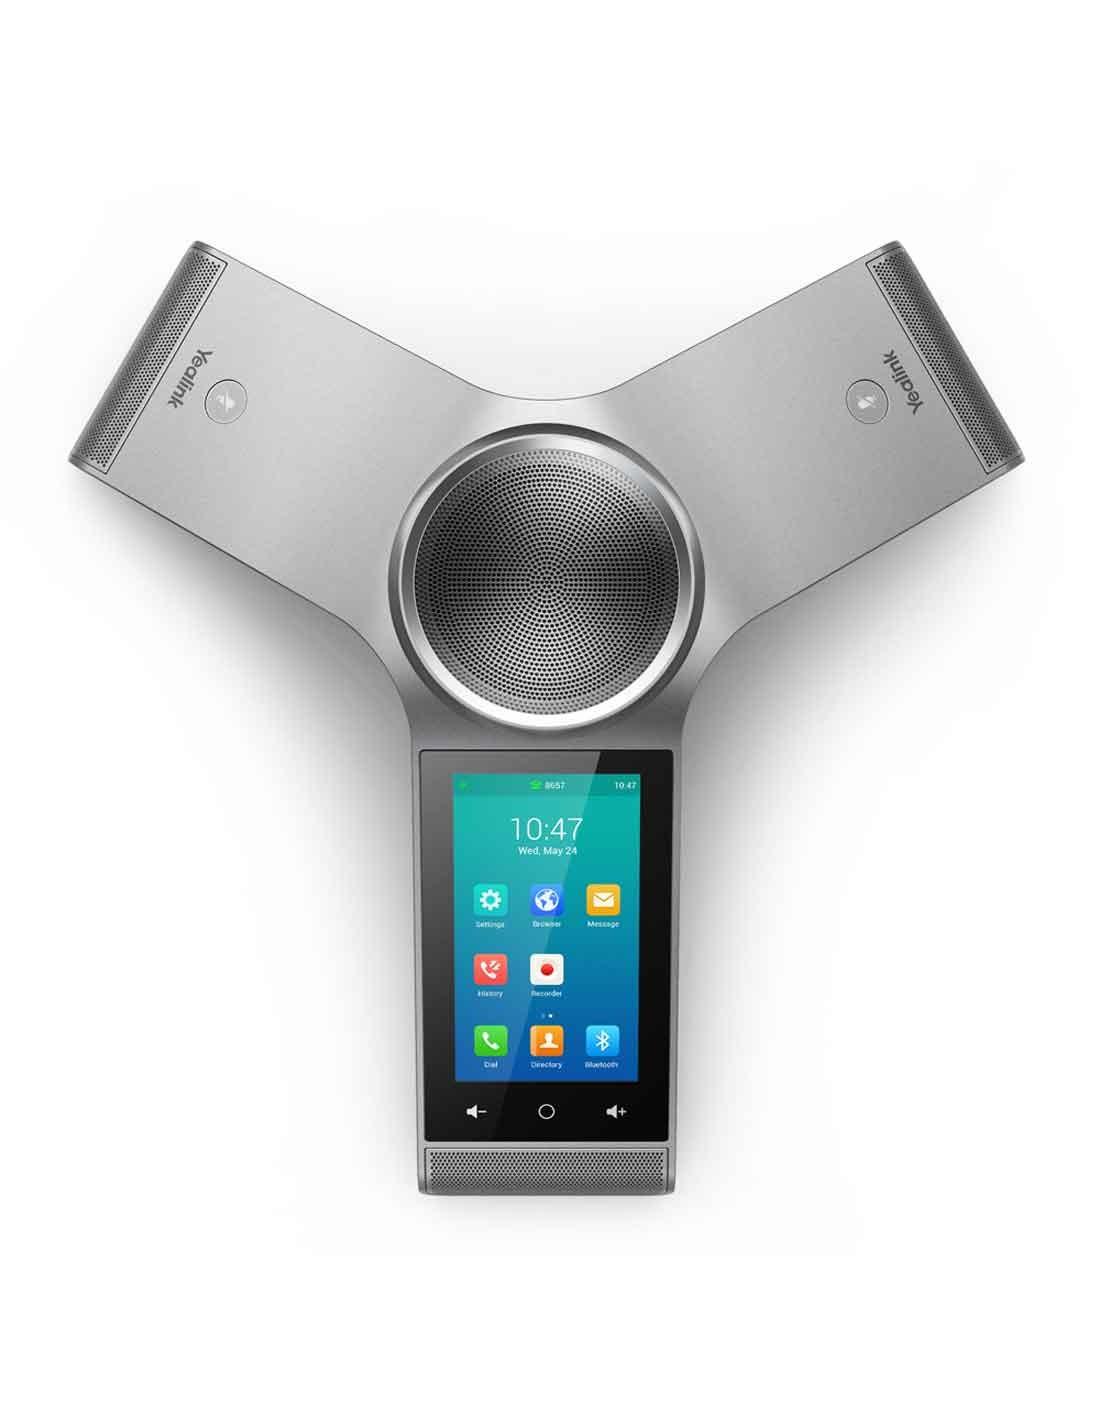 Yealink CP960 IP Phone Images